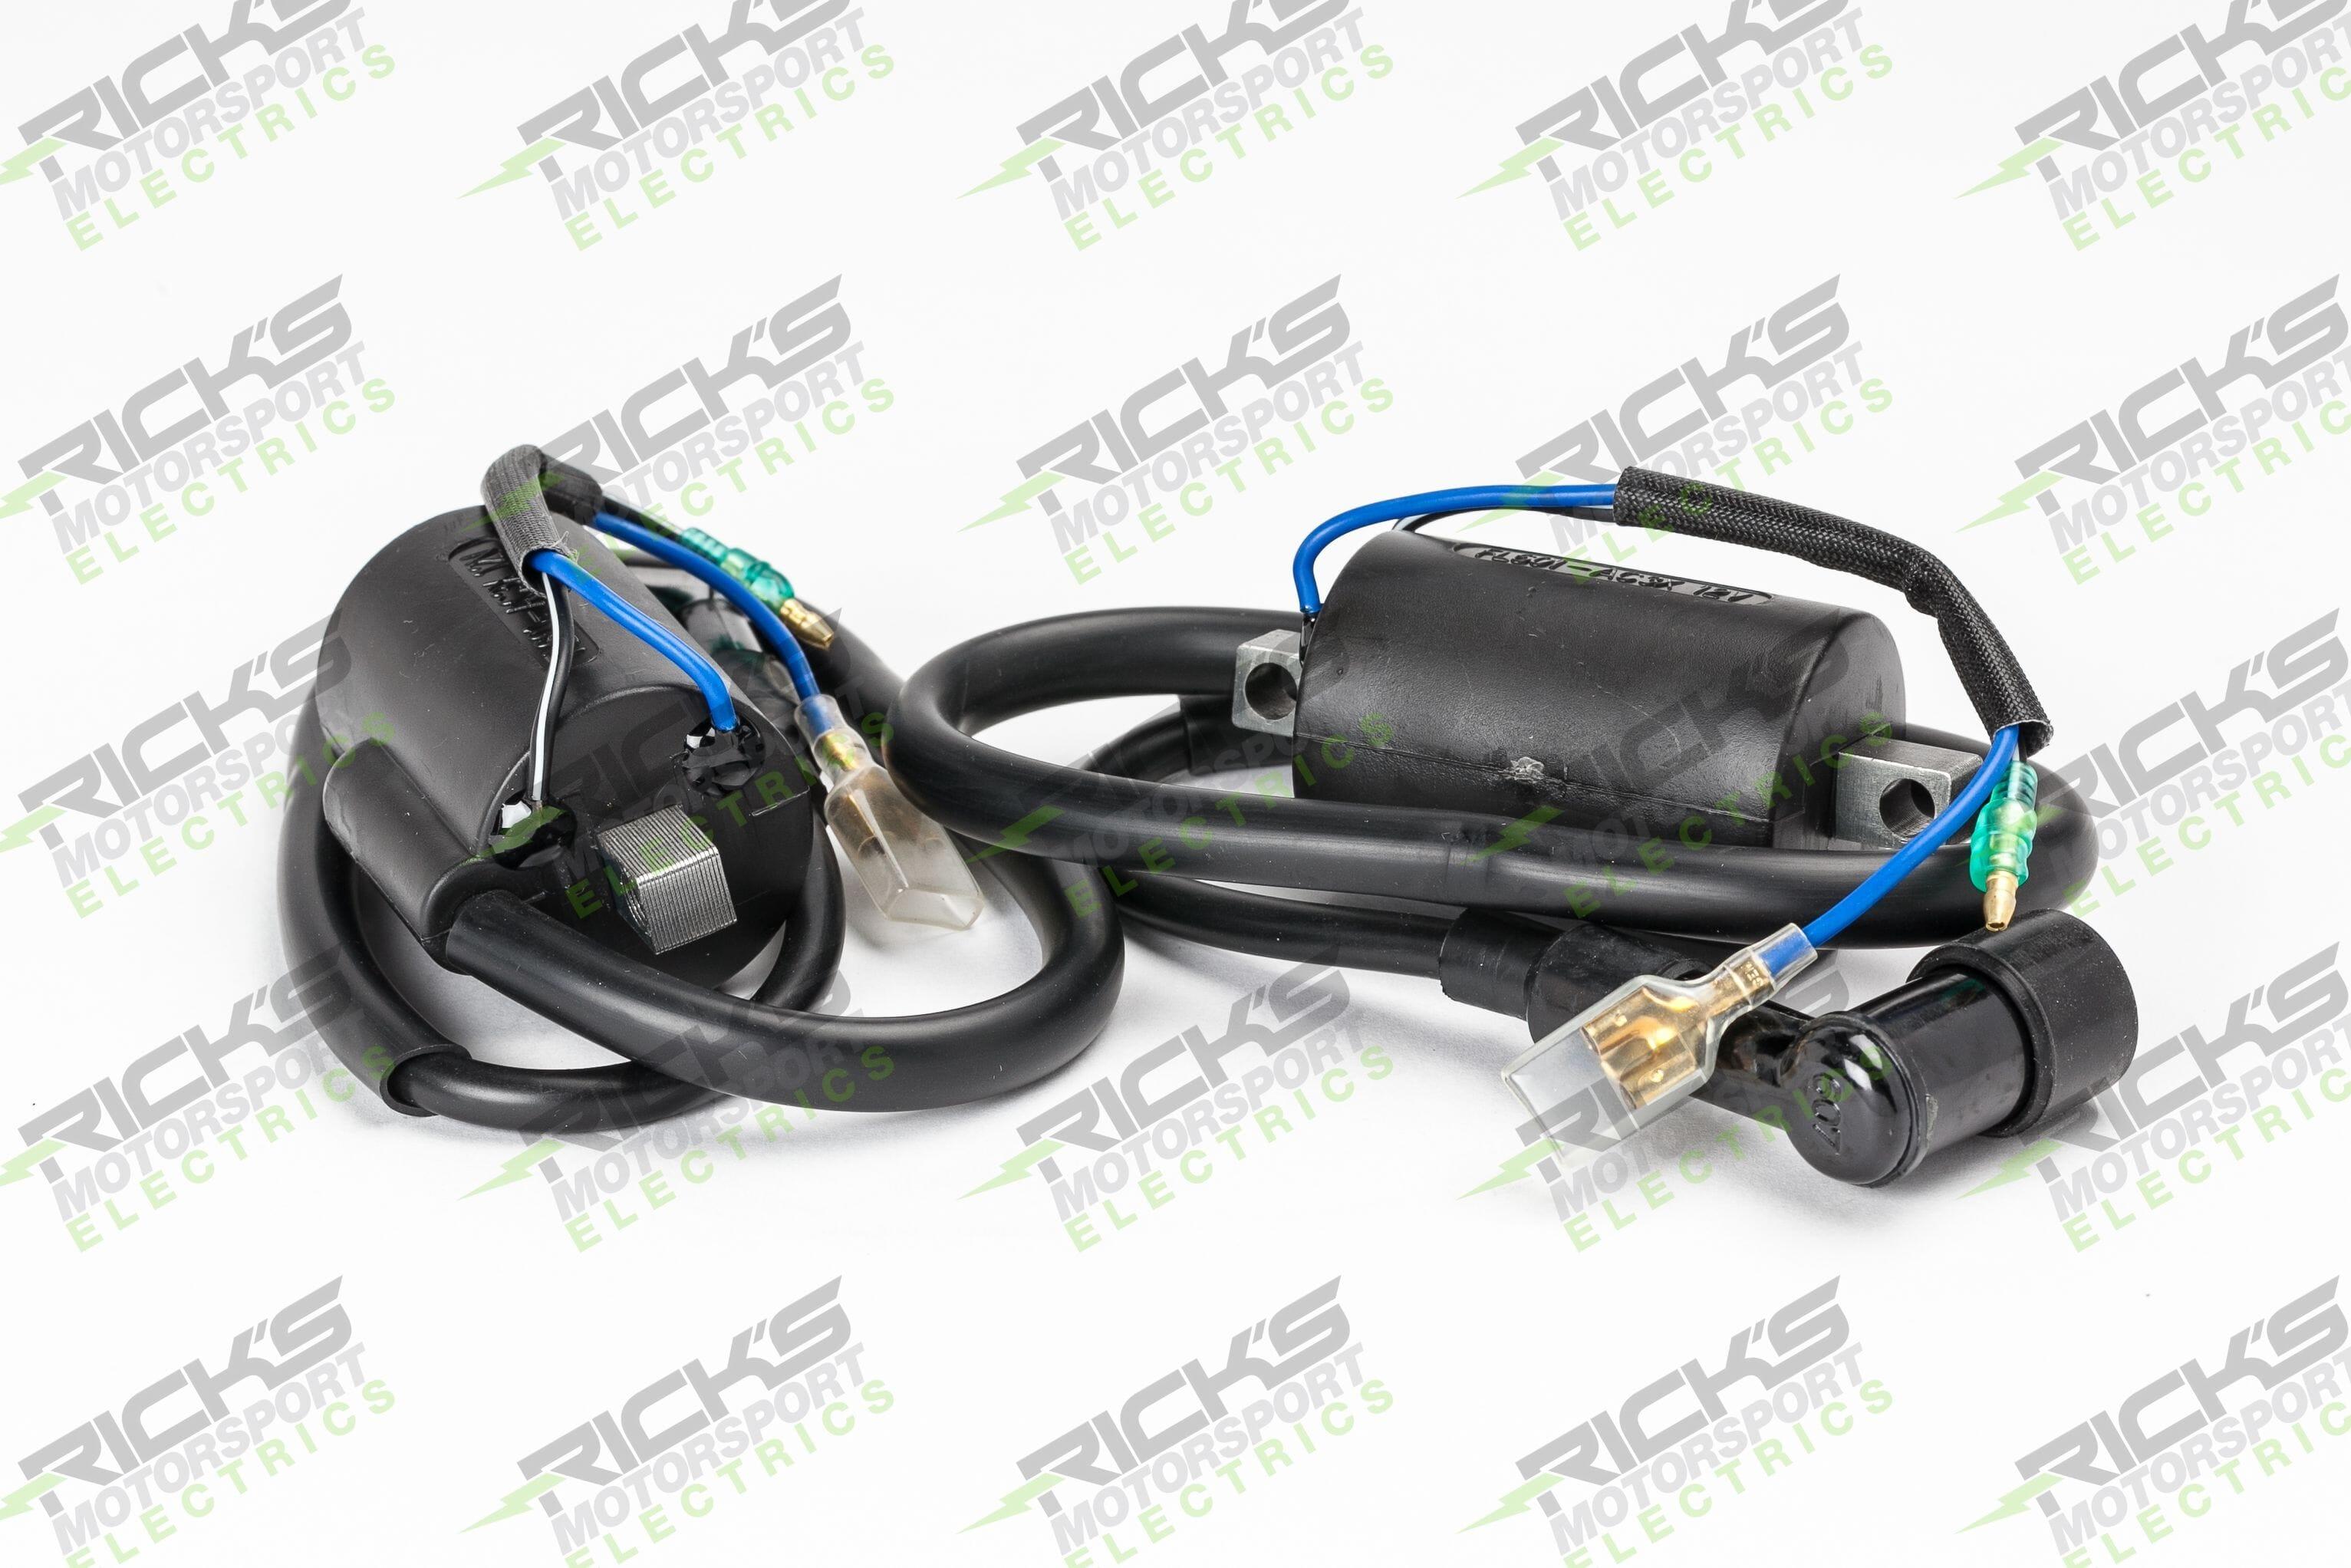 New Honda Ignition Coils 23_103